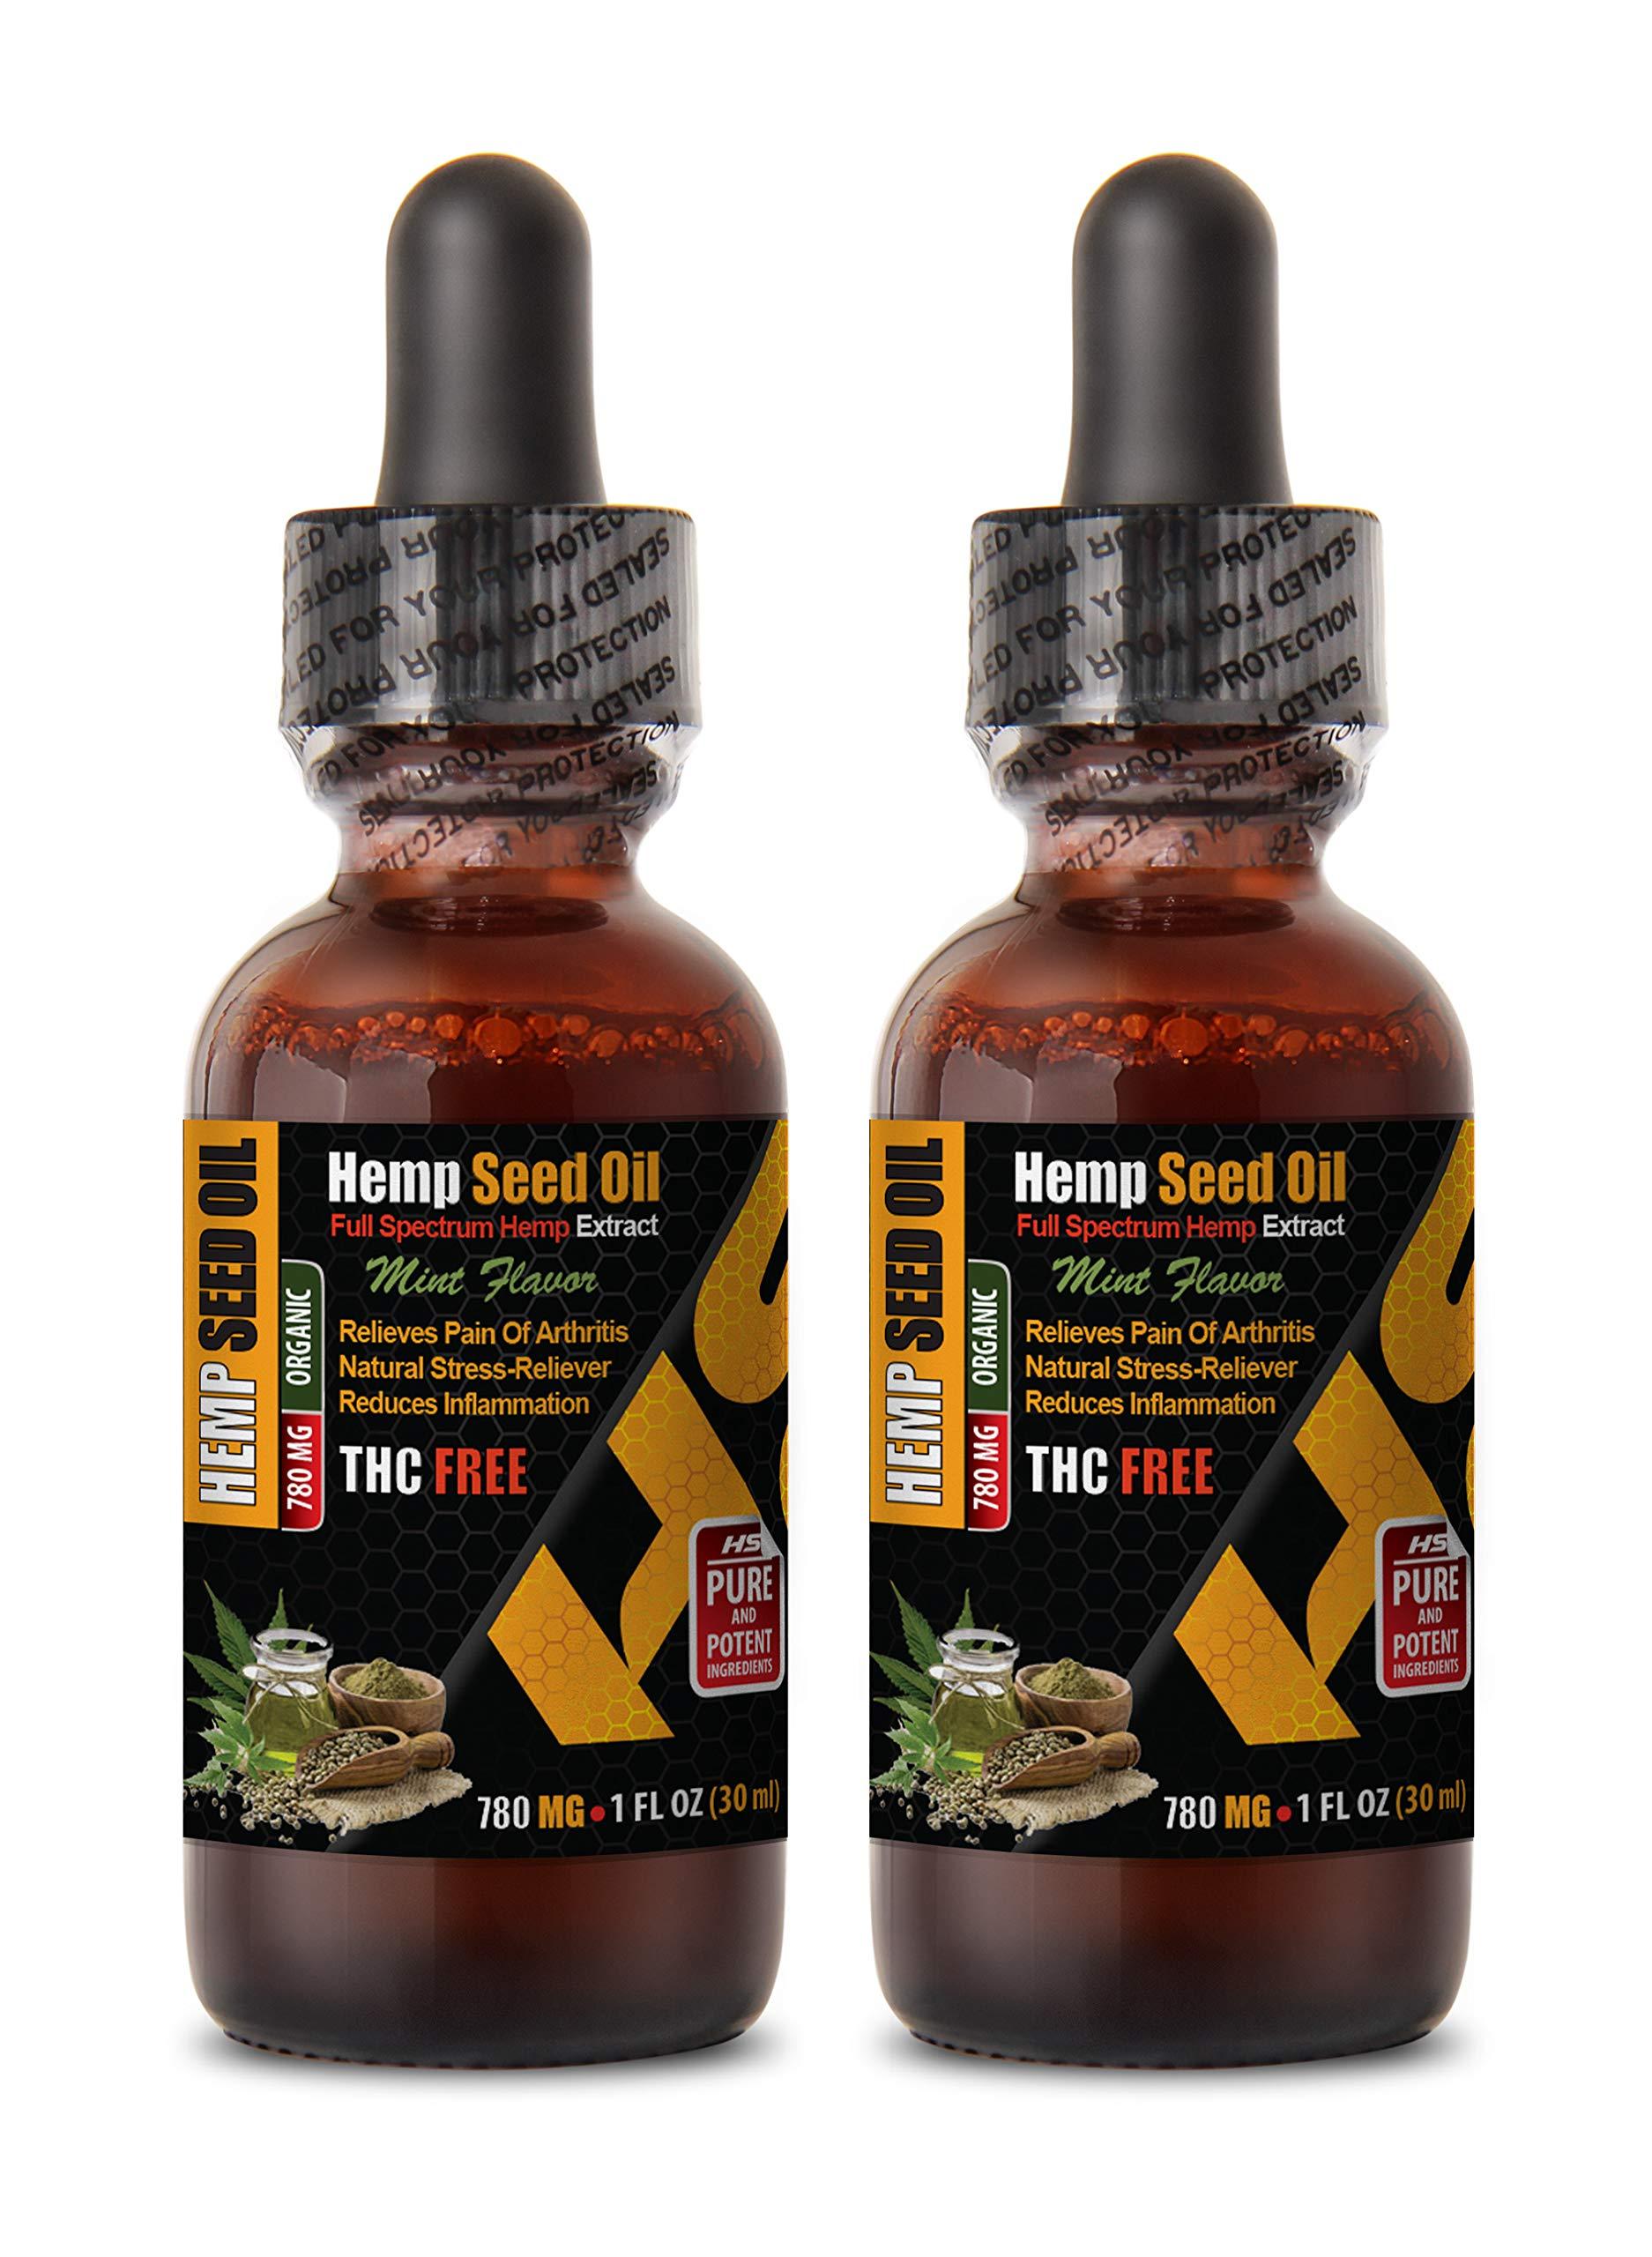 Anti Anxiety Supplements - Hemp Seed Oil Organic Drops 780mg - Mint Flavor - Hemp Oil Relief - 2 Bottles 2 FL OZ (60 ML)